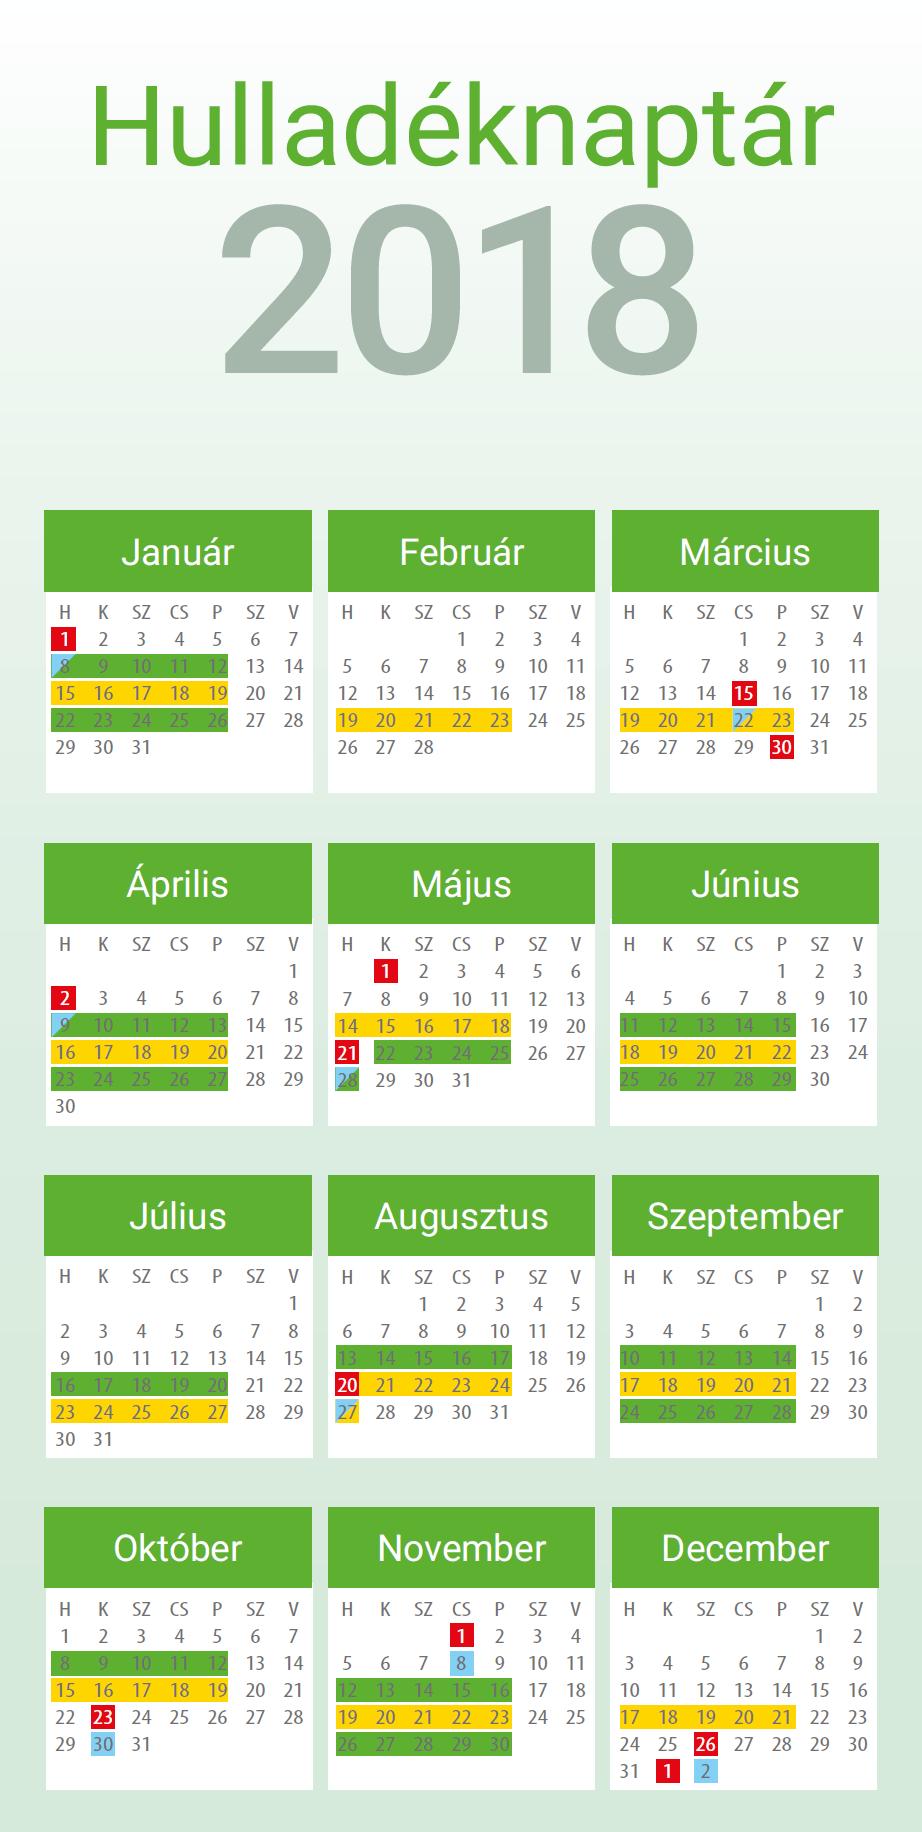 Hulladéknaptár 2018